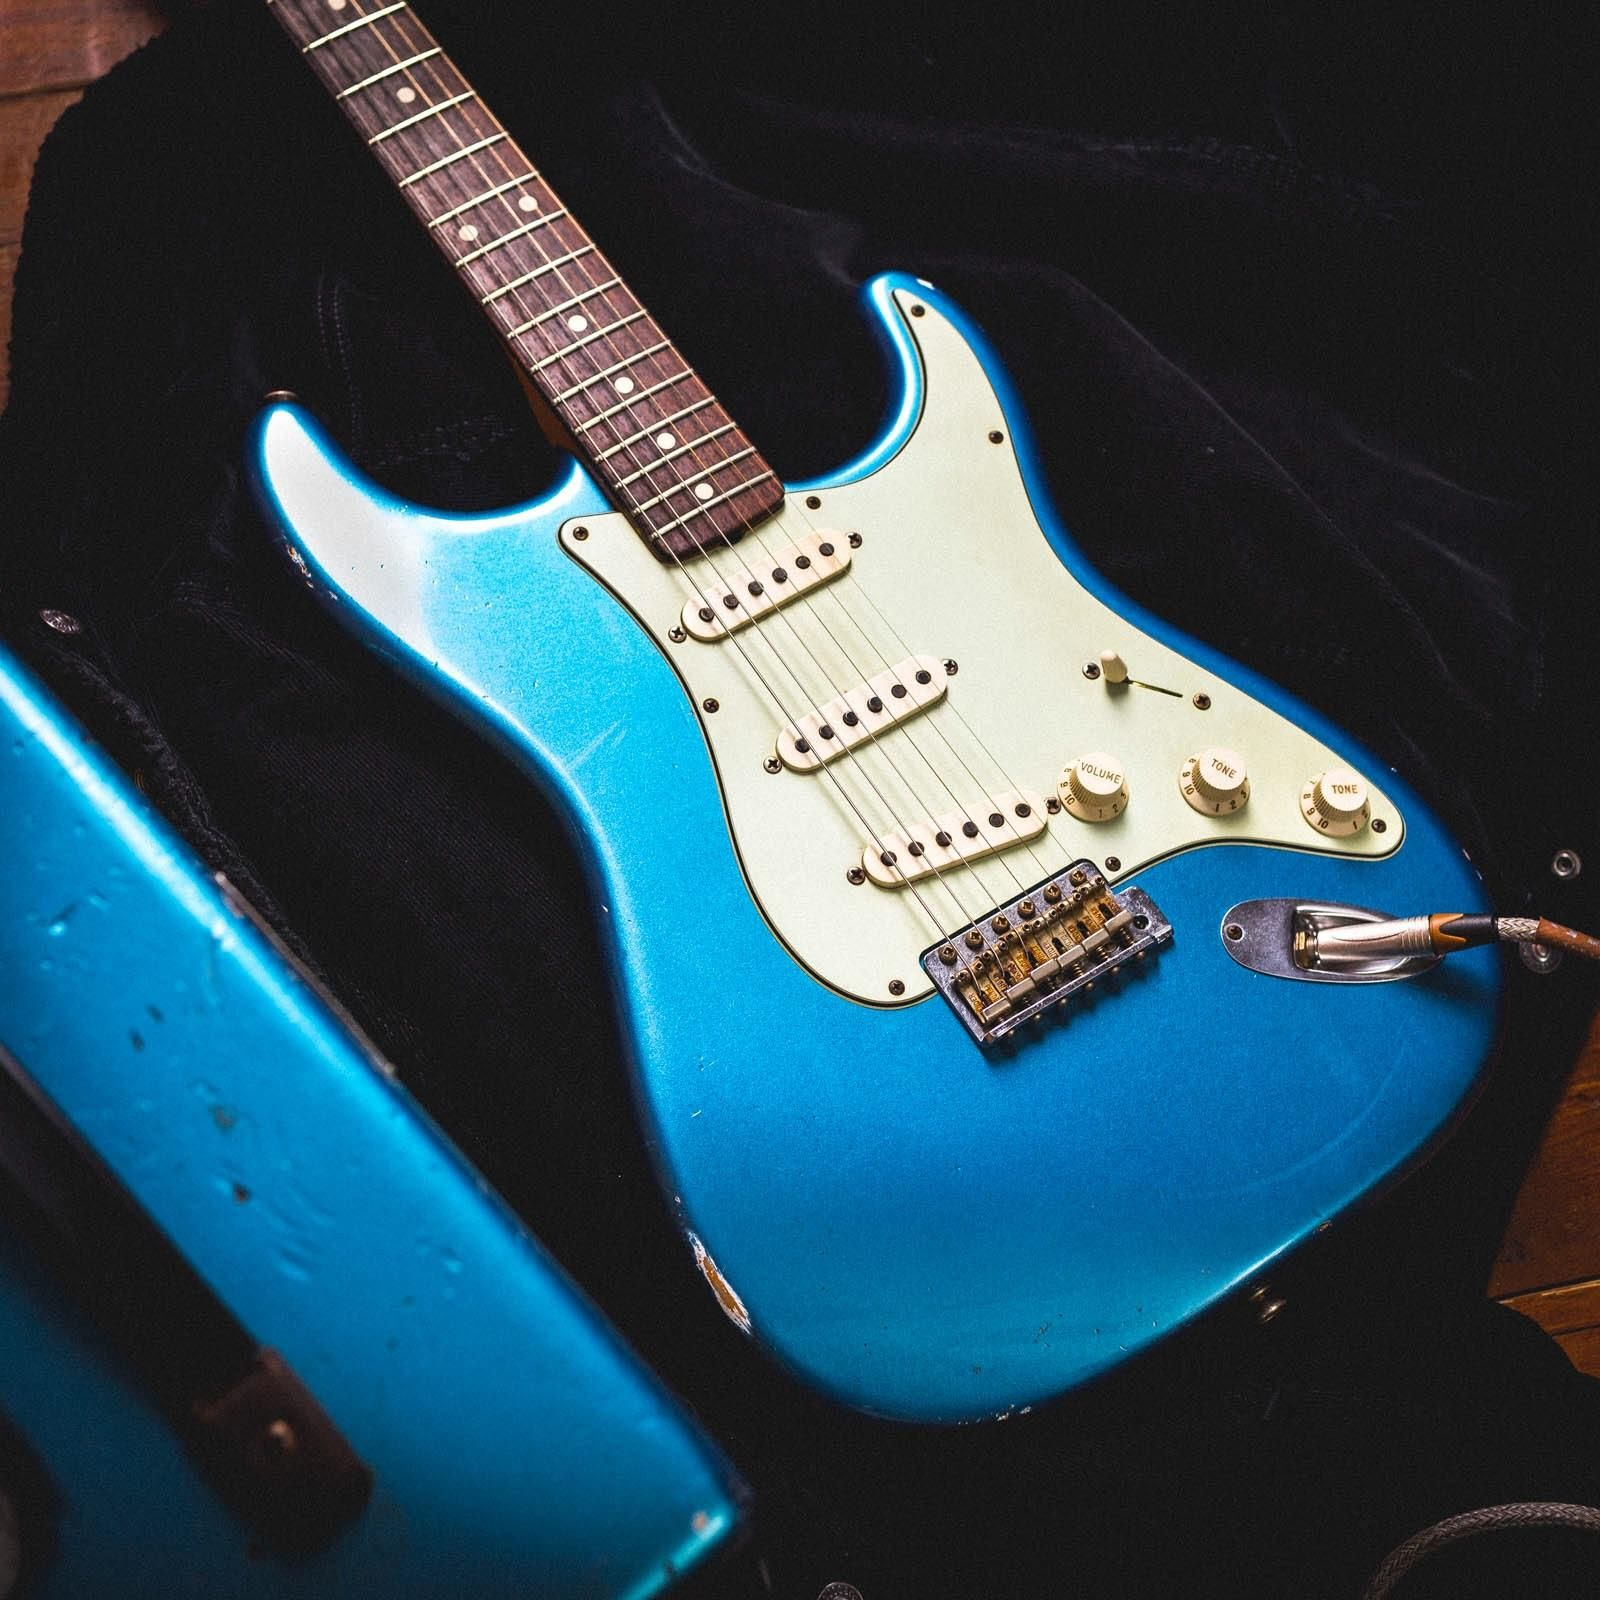 Fender Standard Stratocaster 2006 2017 Reverb >> 2006 Fender Custom Shop Namm Special Ltd 59 Stratocaster Pro